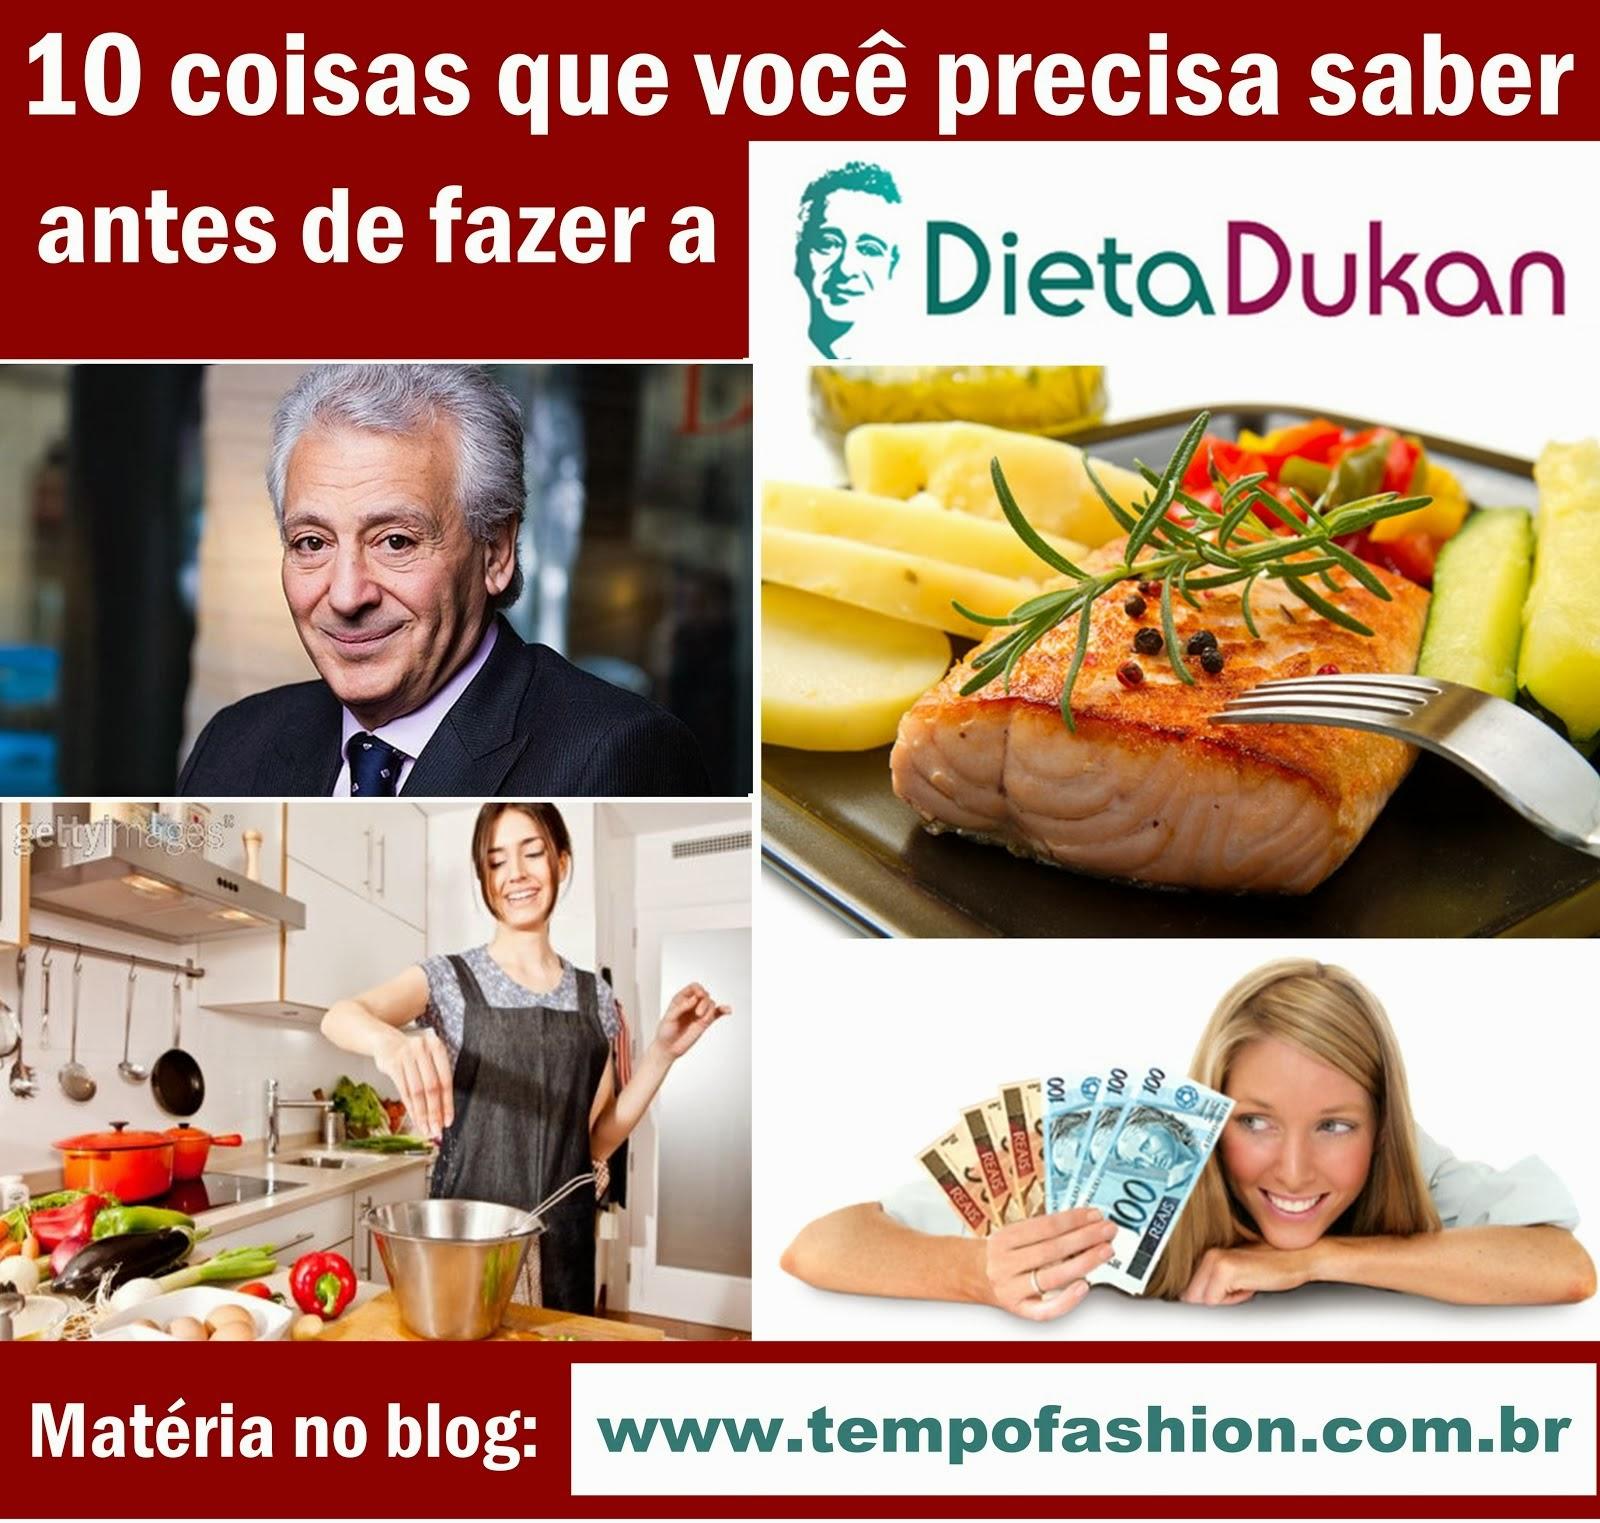 Dieta Dukan - se informe antes de fazer